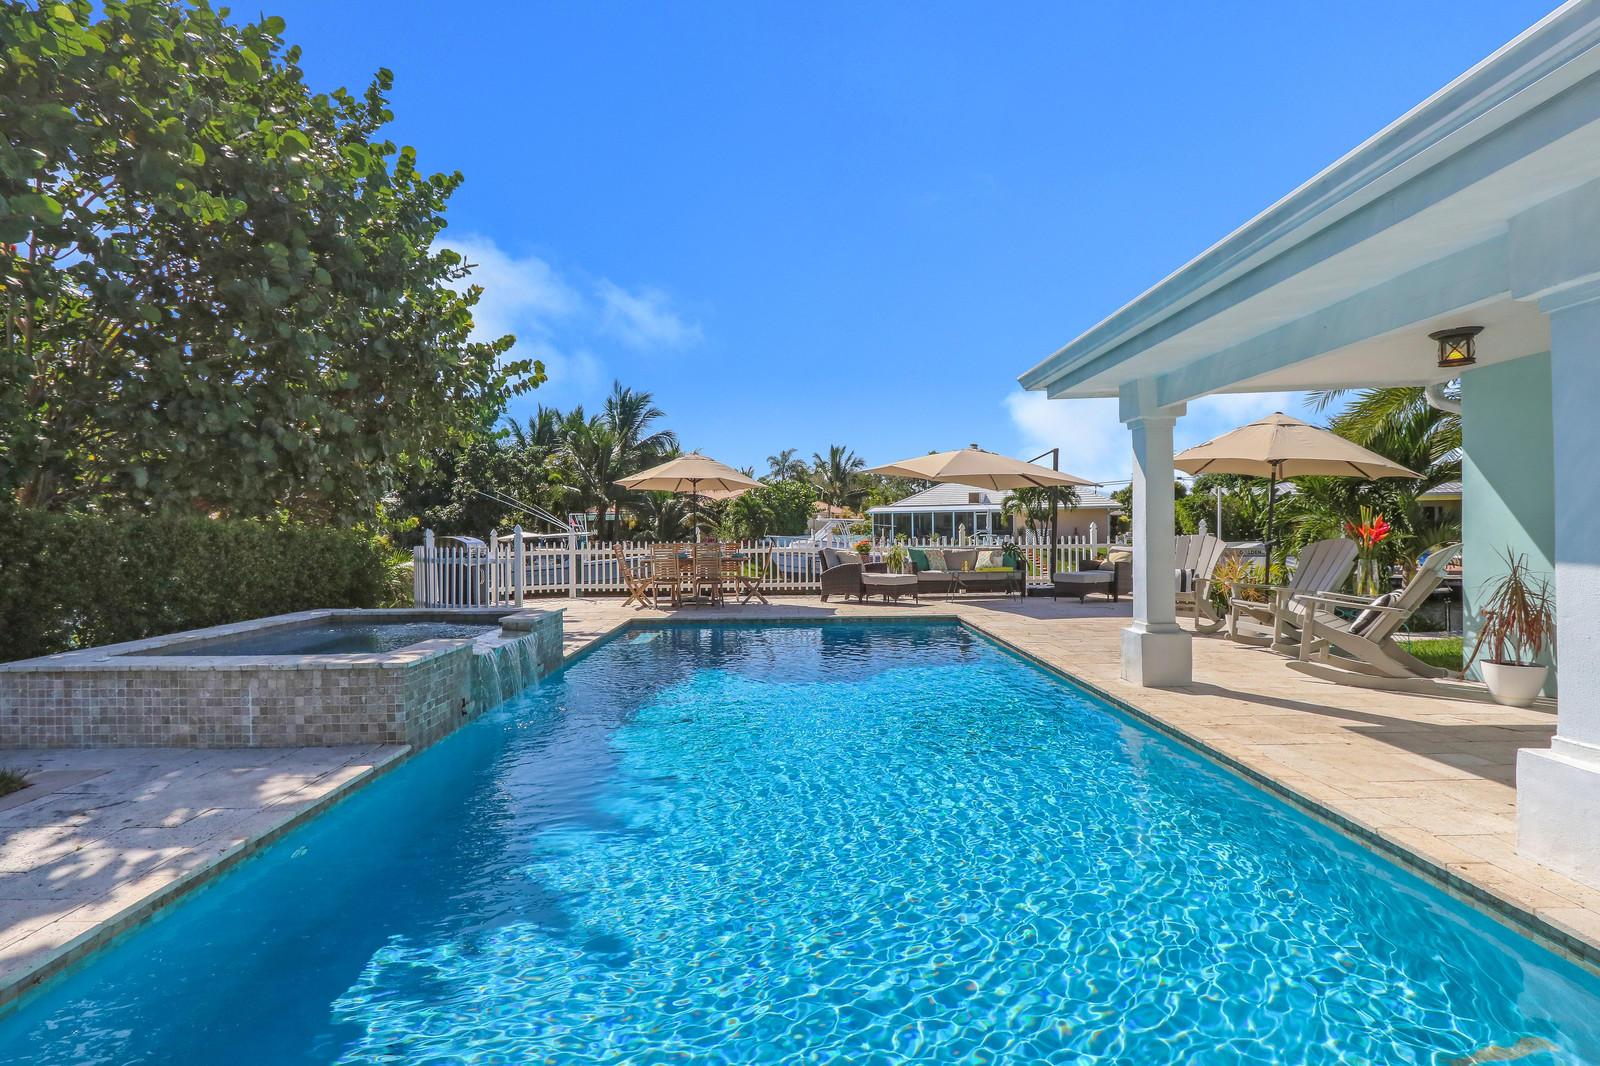 724 Jacana Way, North Palm Beach, Florida 33408, 3 Bedrooms Bedrooms, ,2 BathroomsBathrooms,A,Single family,Jacana,RX-10475679